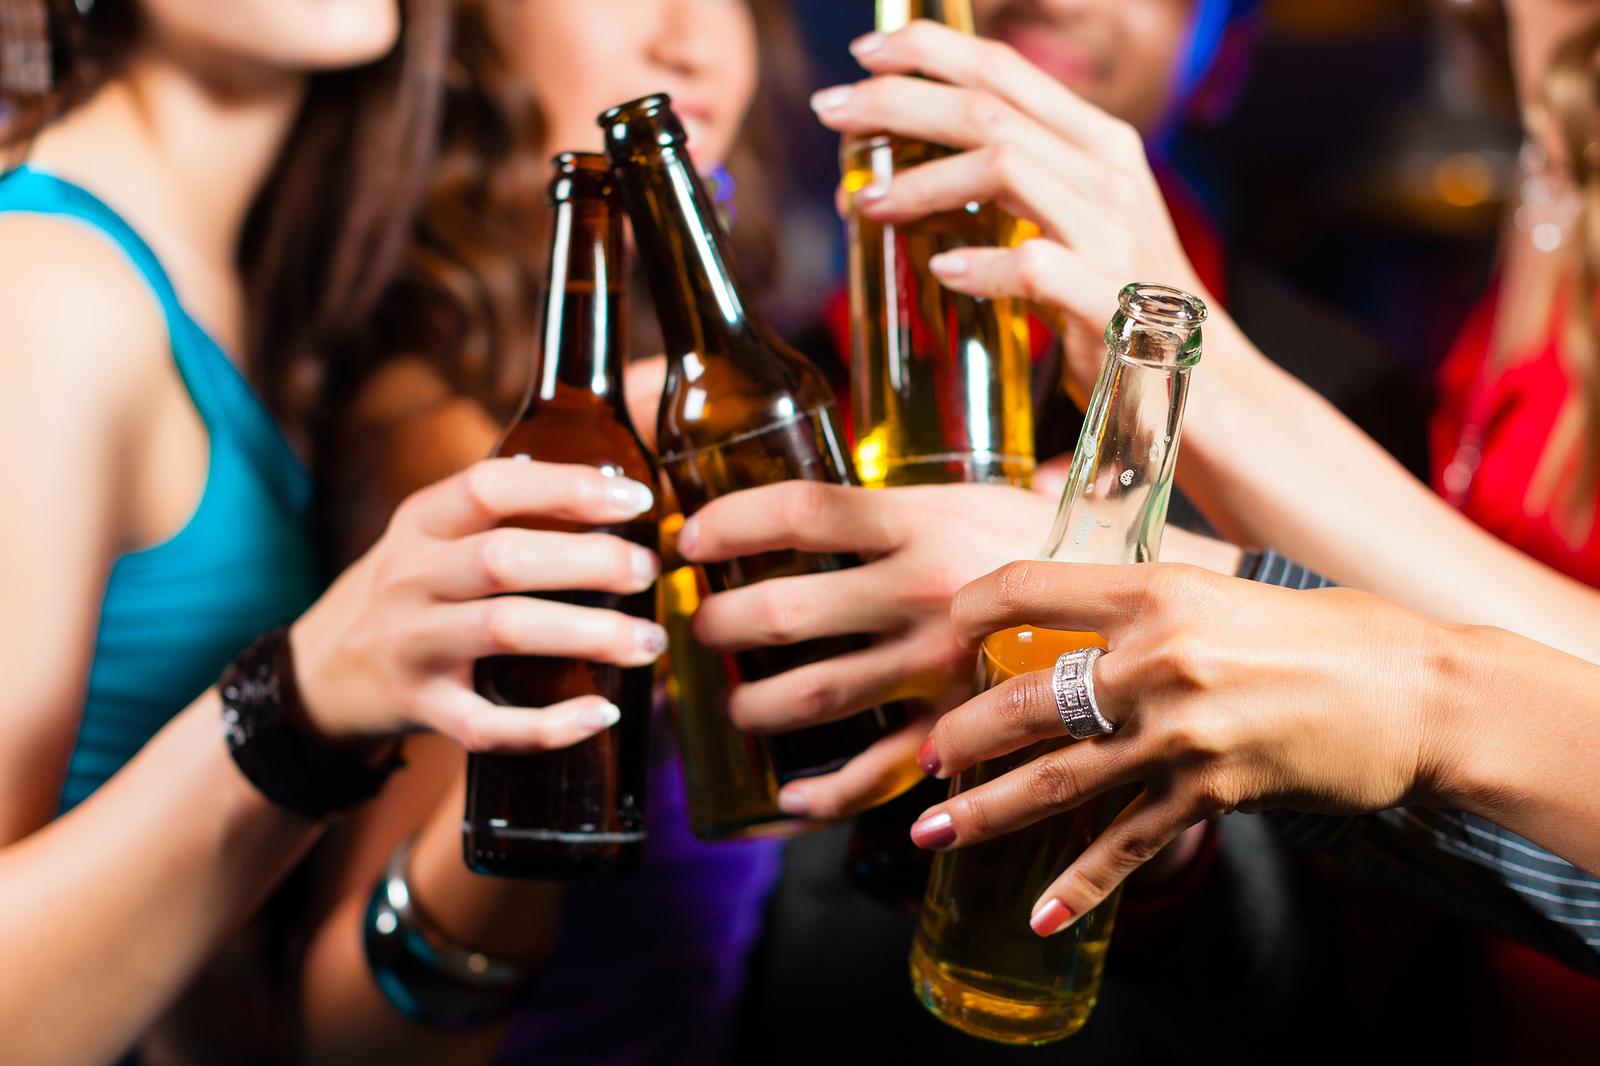 Improve your Establishment with a Bar POS System